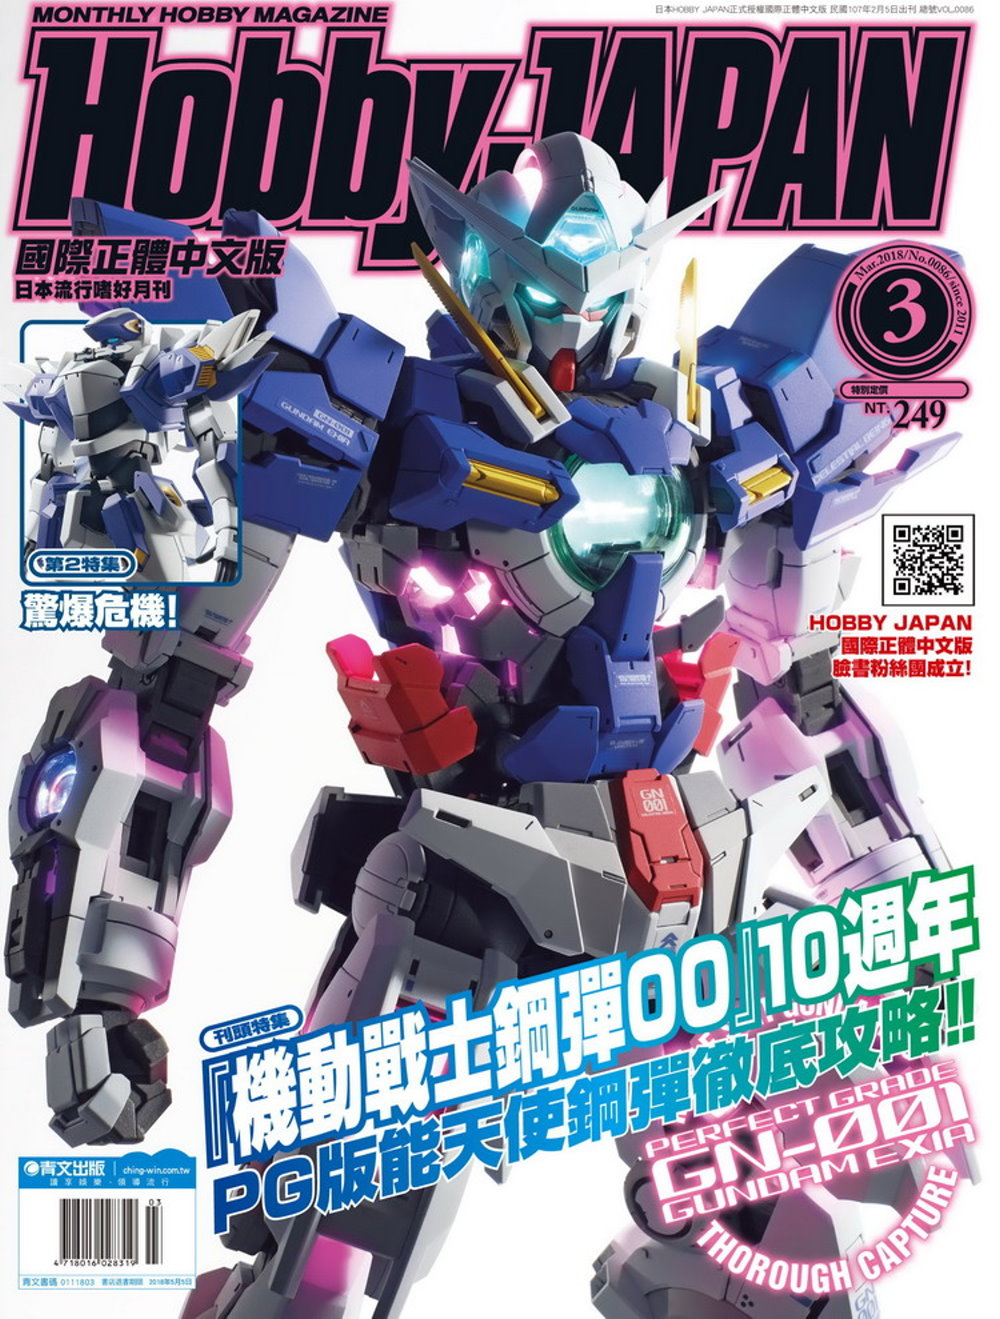 HOBBY JAPAN 3月號/2018 第86期